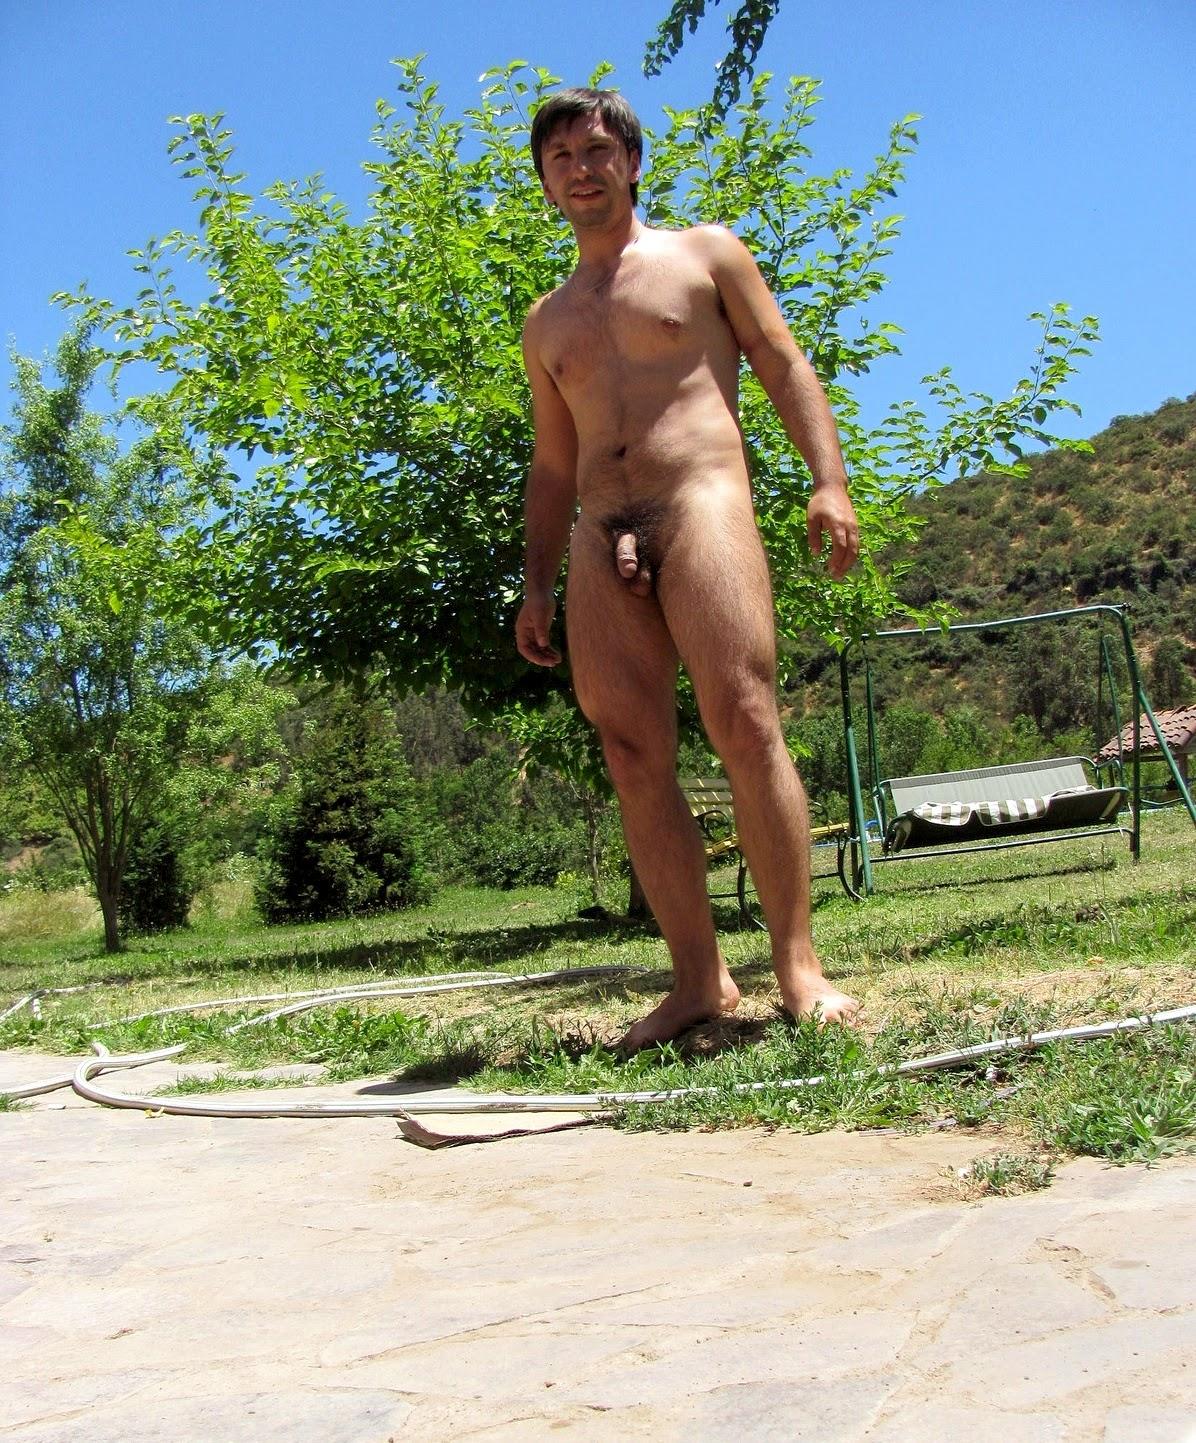 Backyard nudist